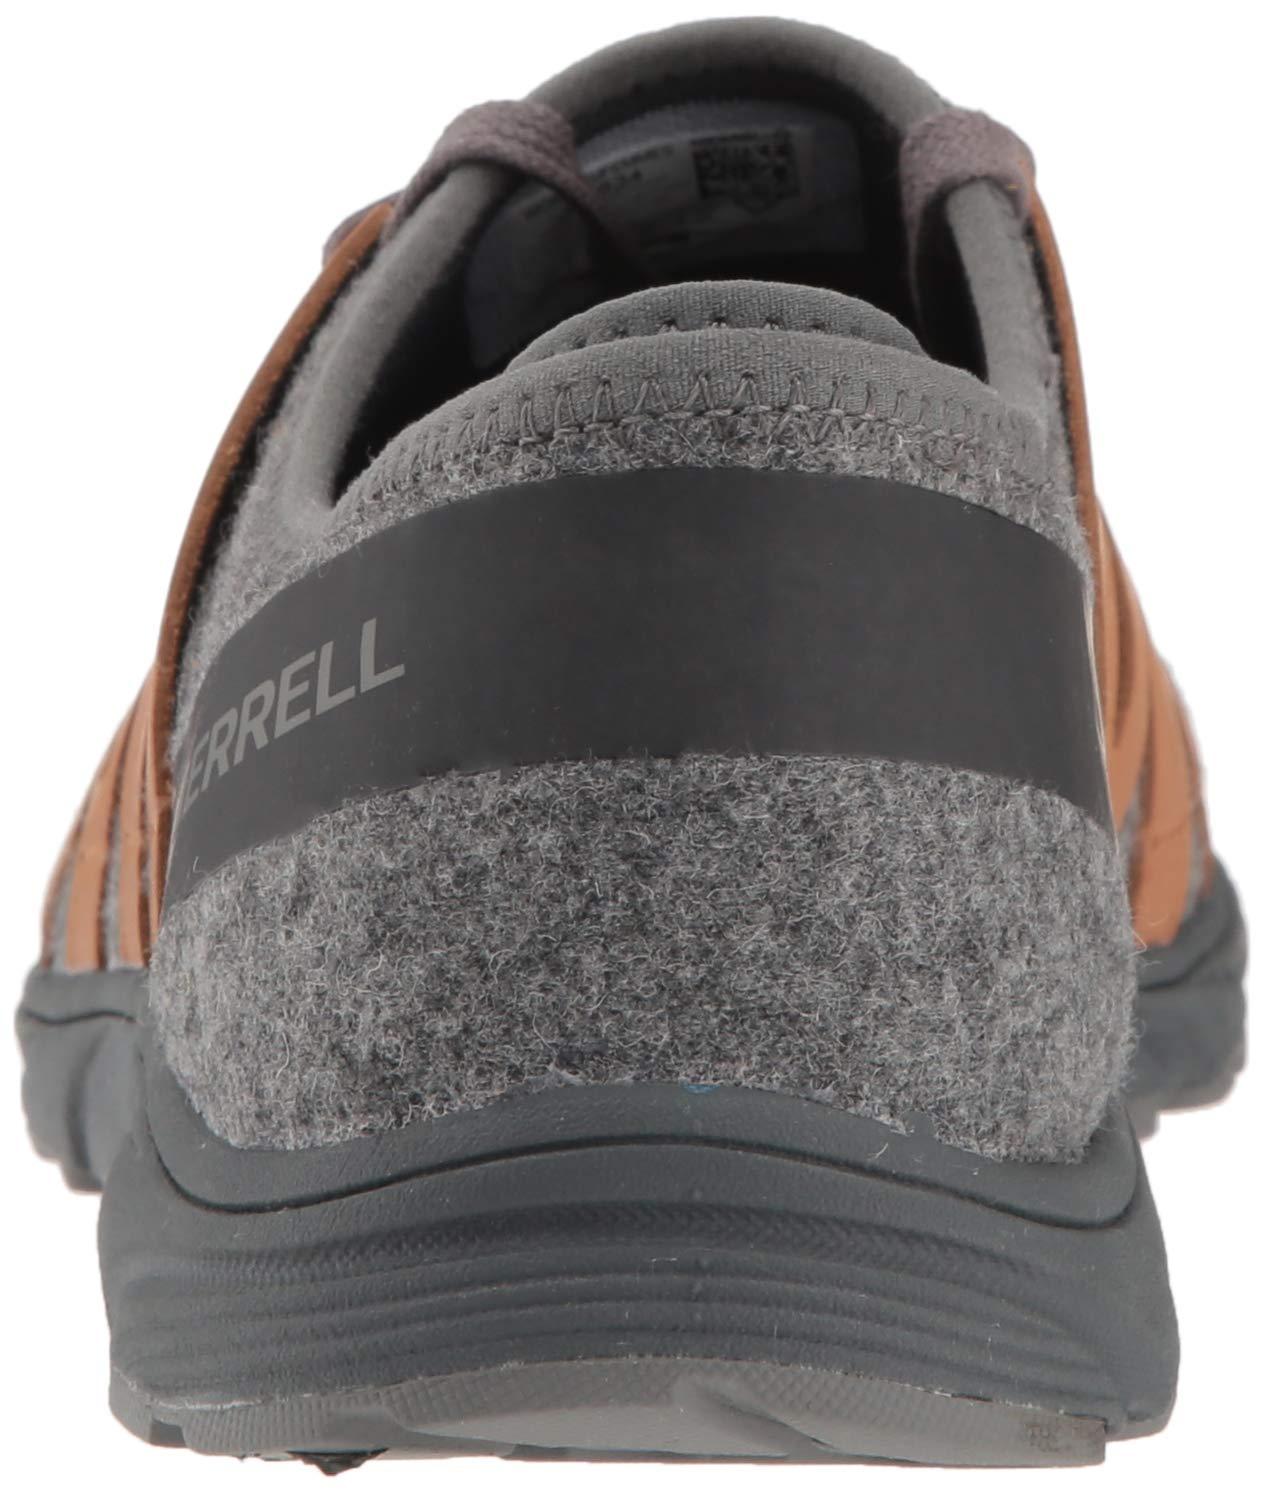 Merrell Women's Riveter Wool Sneaker Charcoal 8 M US by Merrell (Image #2)